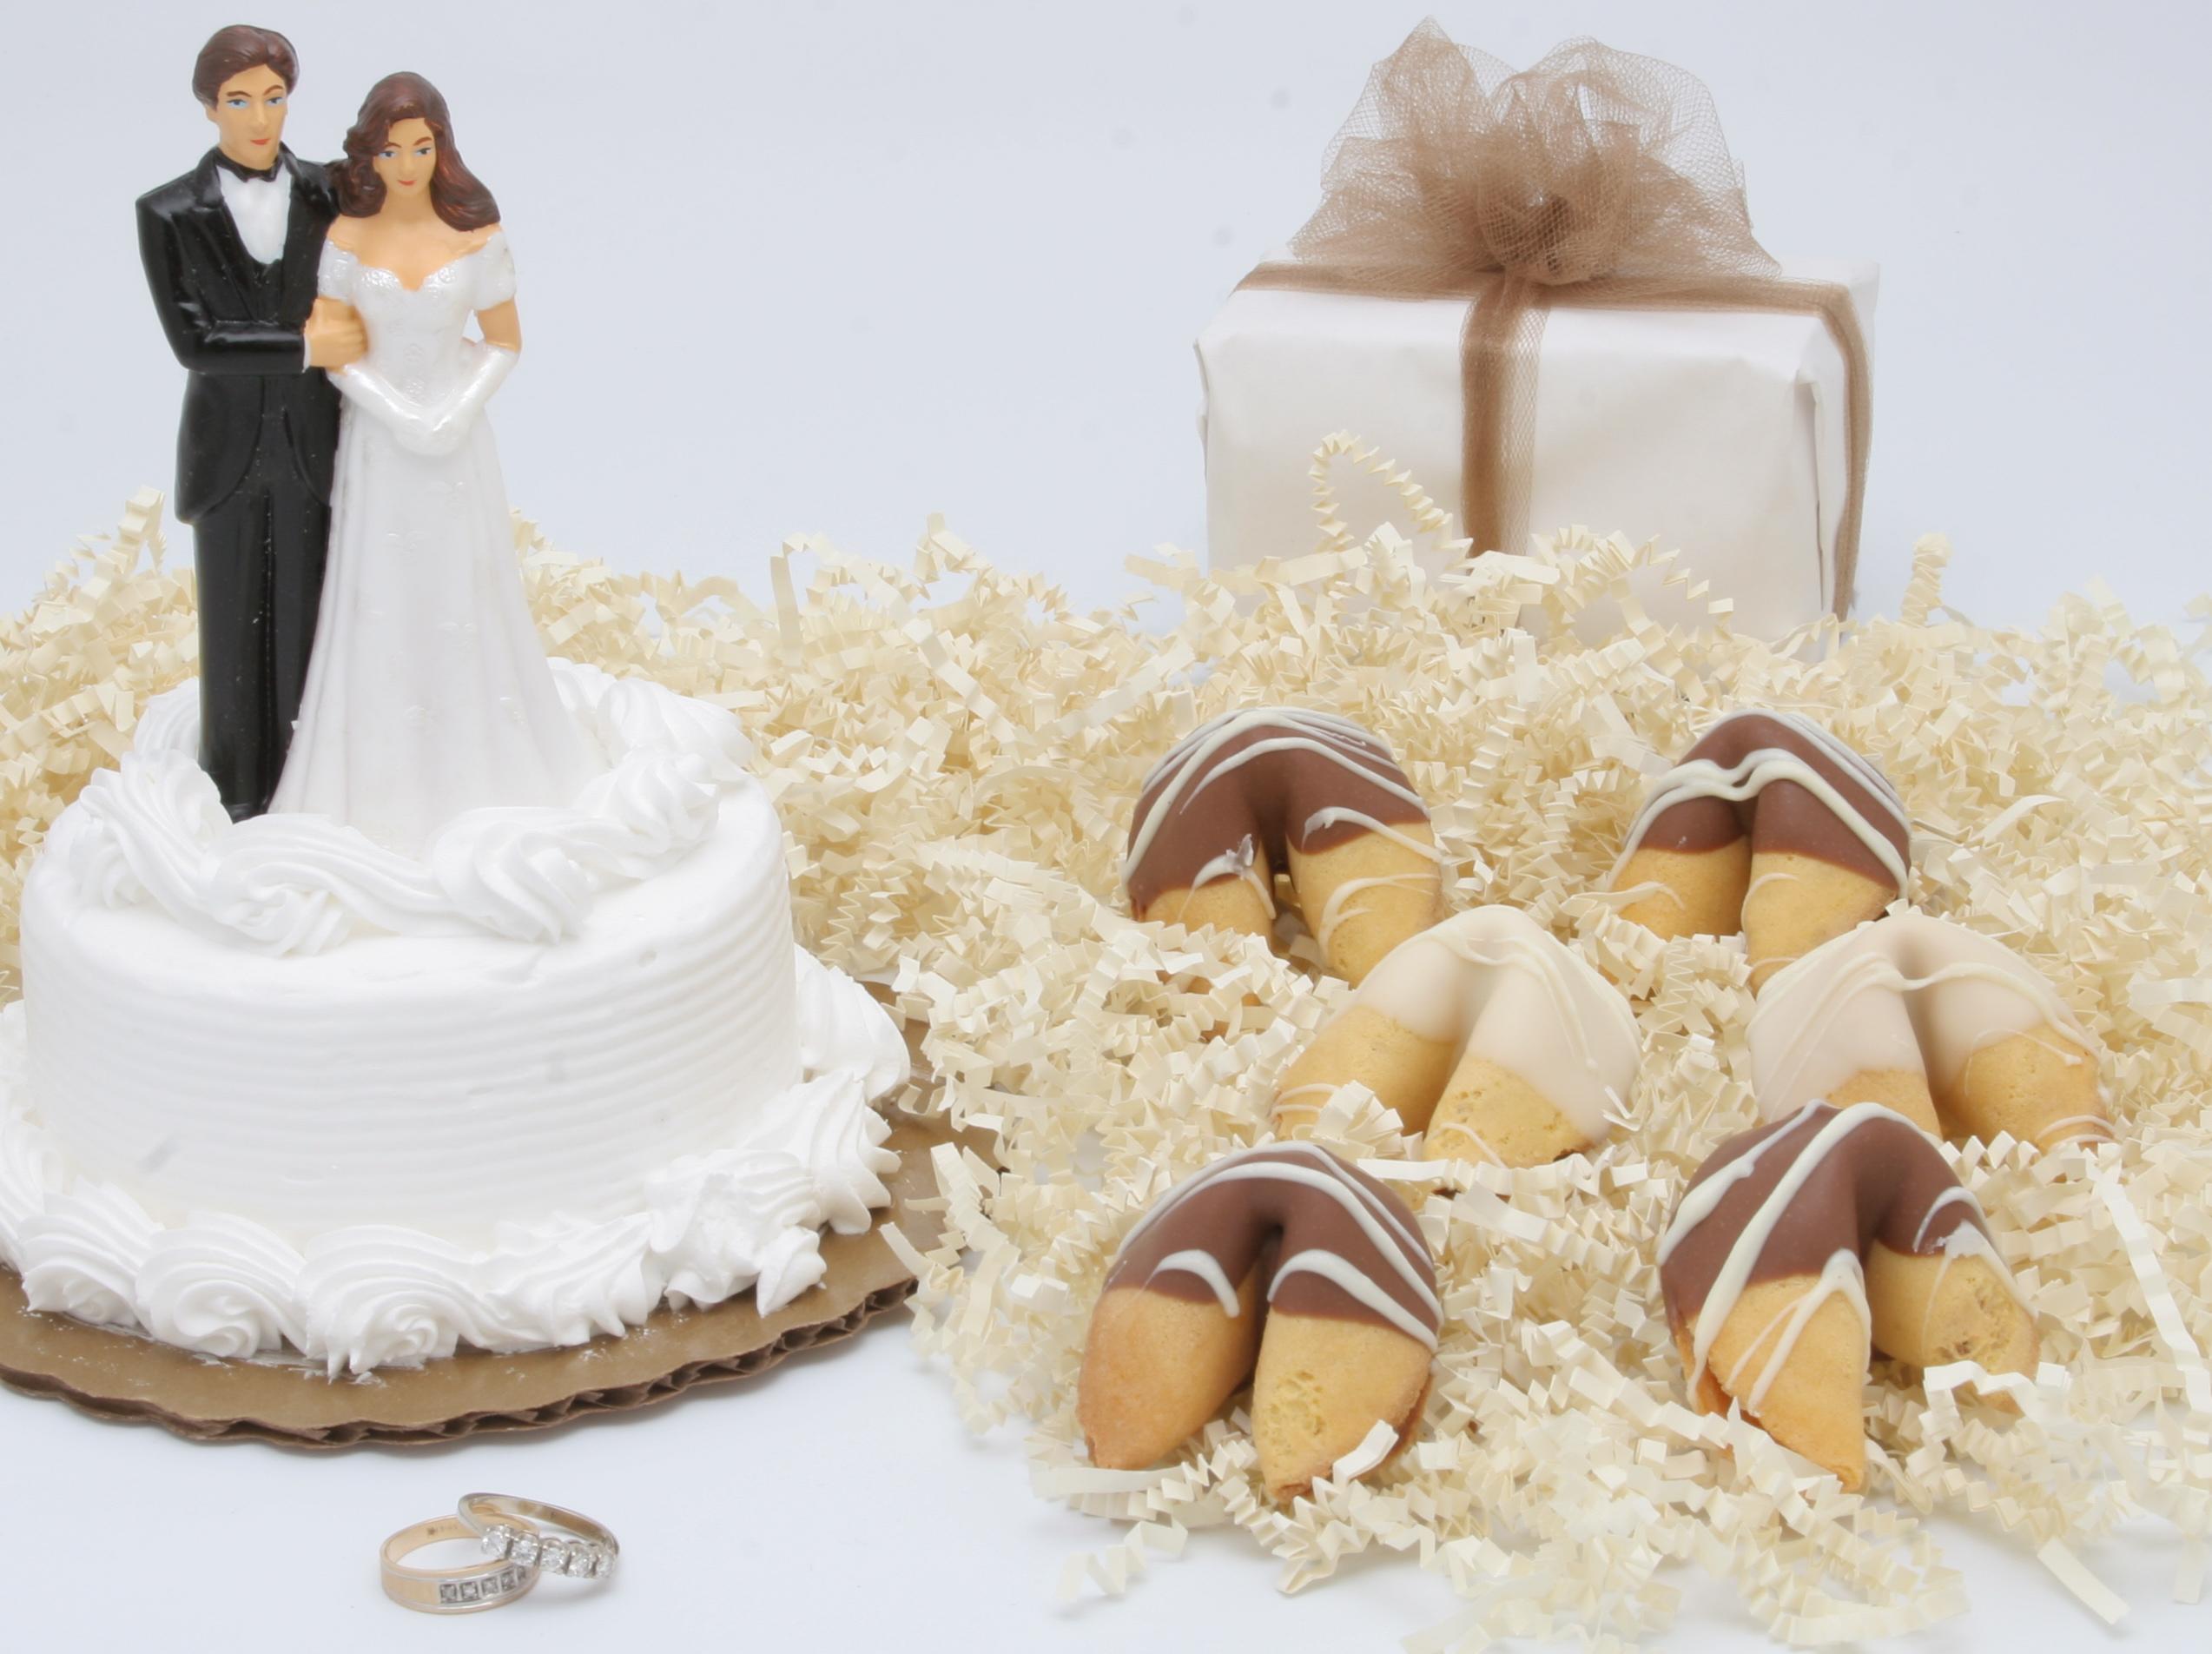 File:WeddingFortuneCookies.jpg - Wikimedia Commons